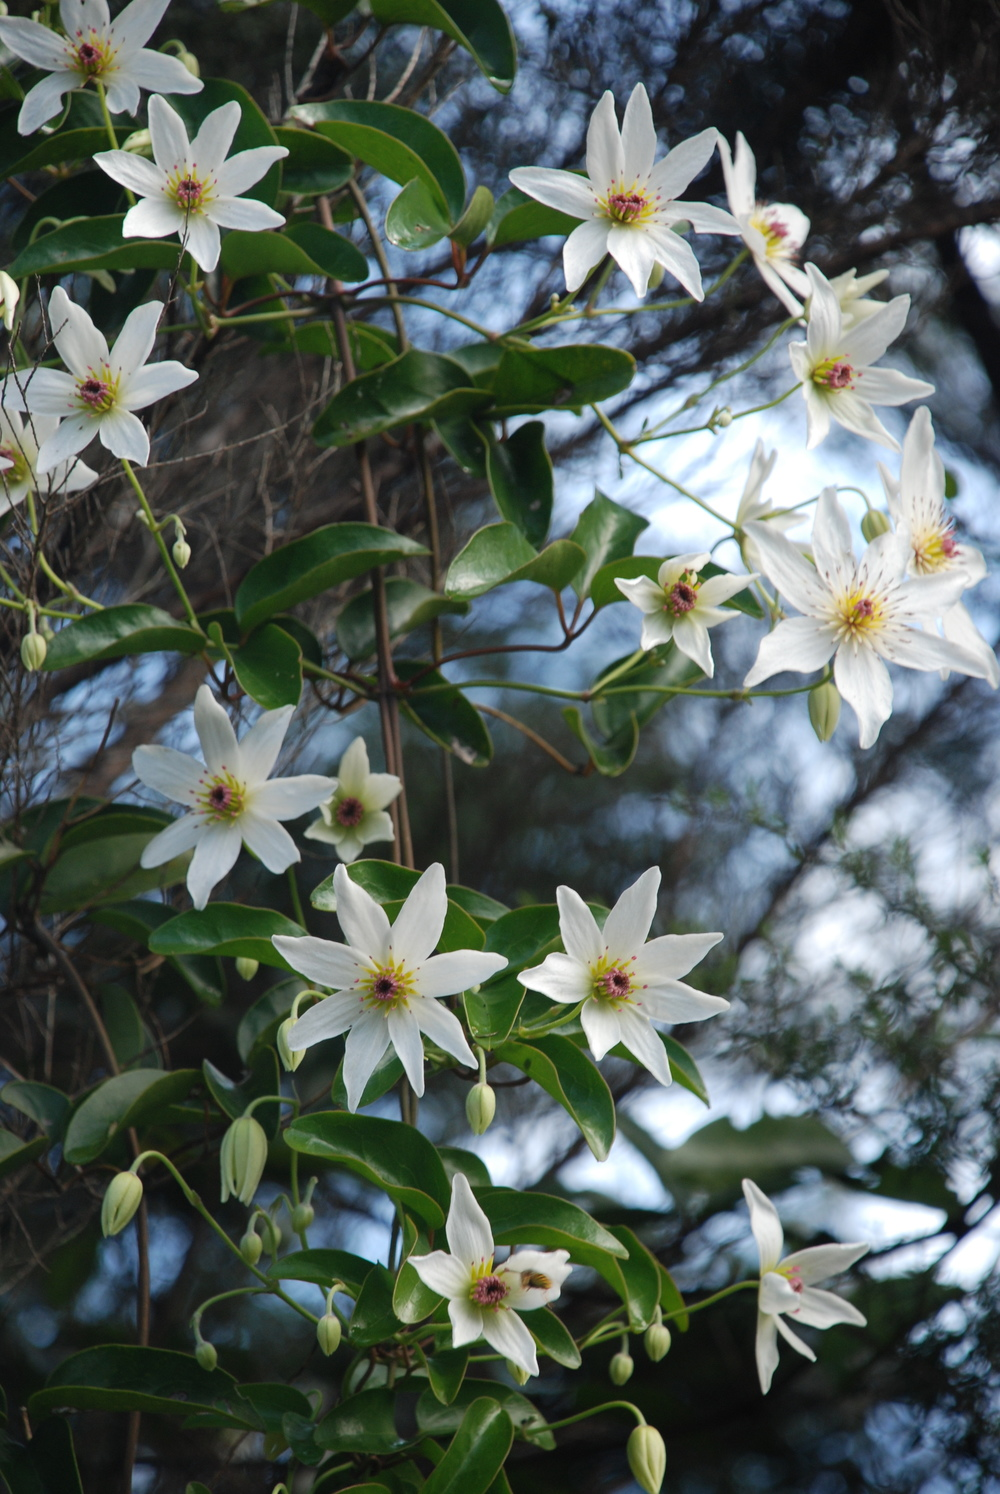 Common Name: white clematis, puawananga. Species:Clematis paniculata